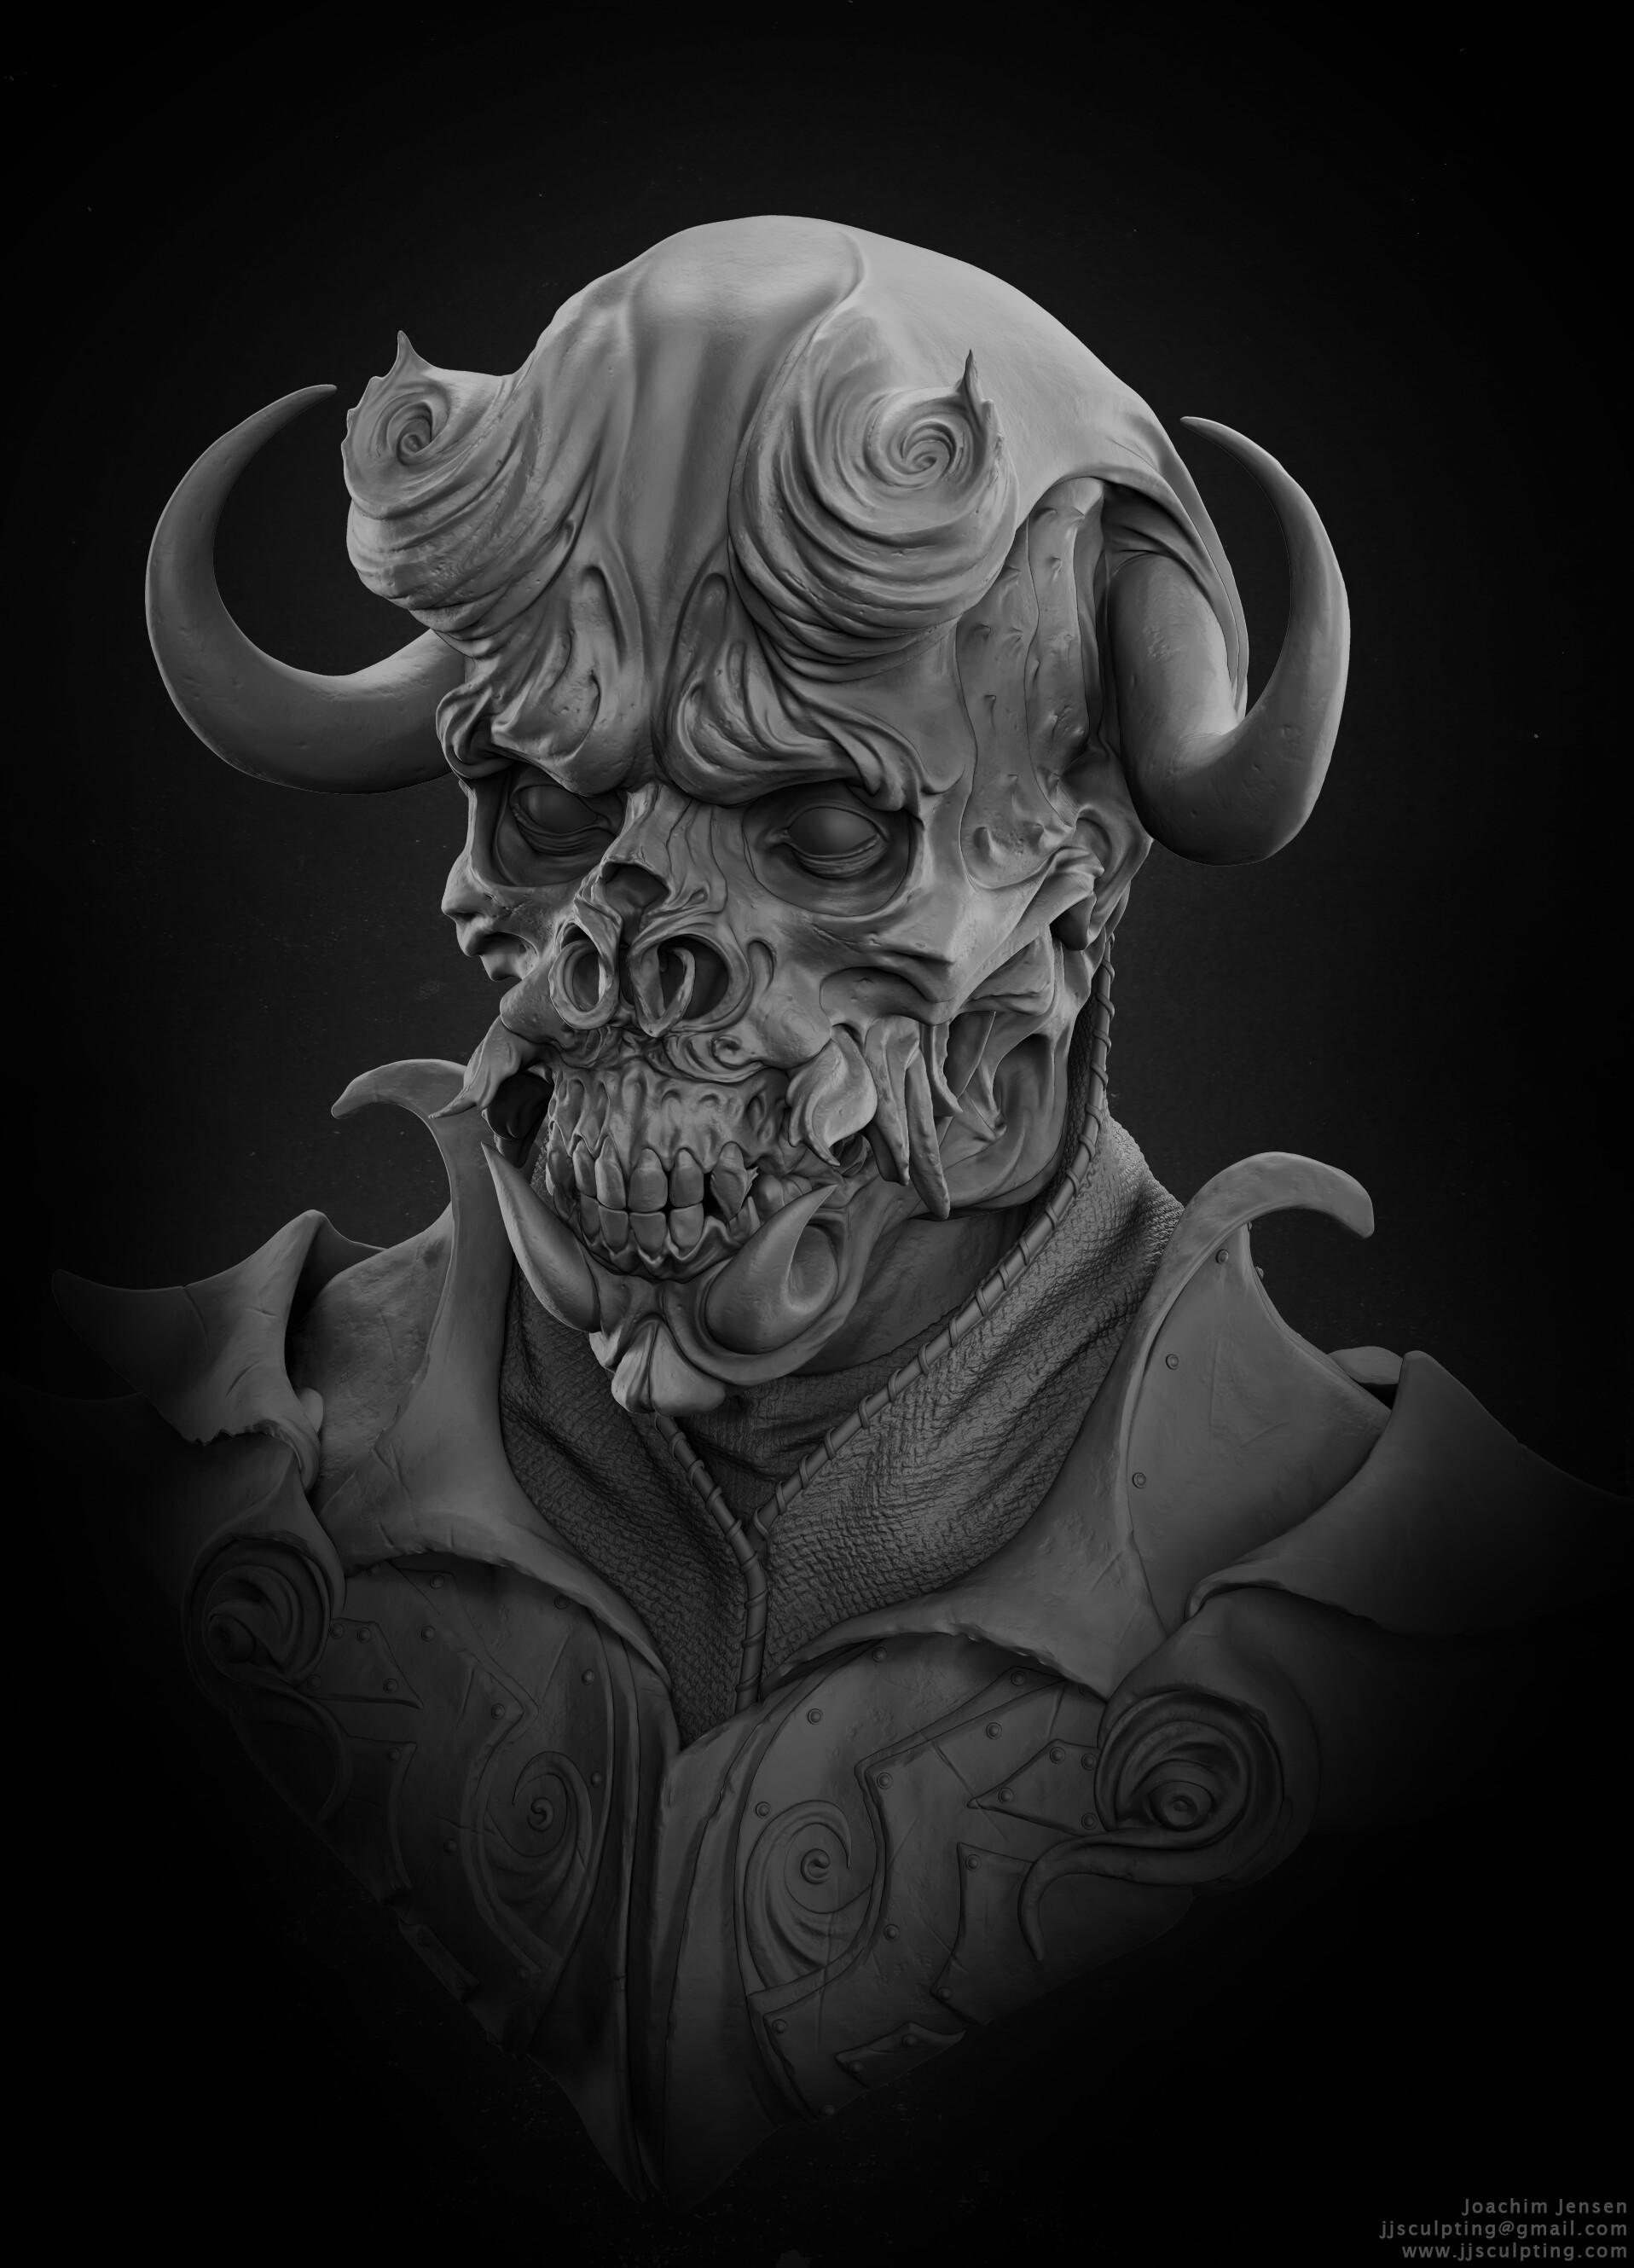 Joachim jensen clay render